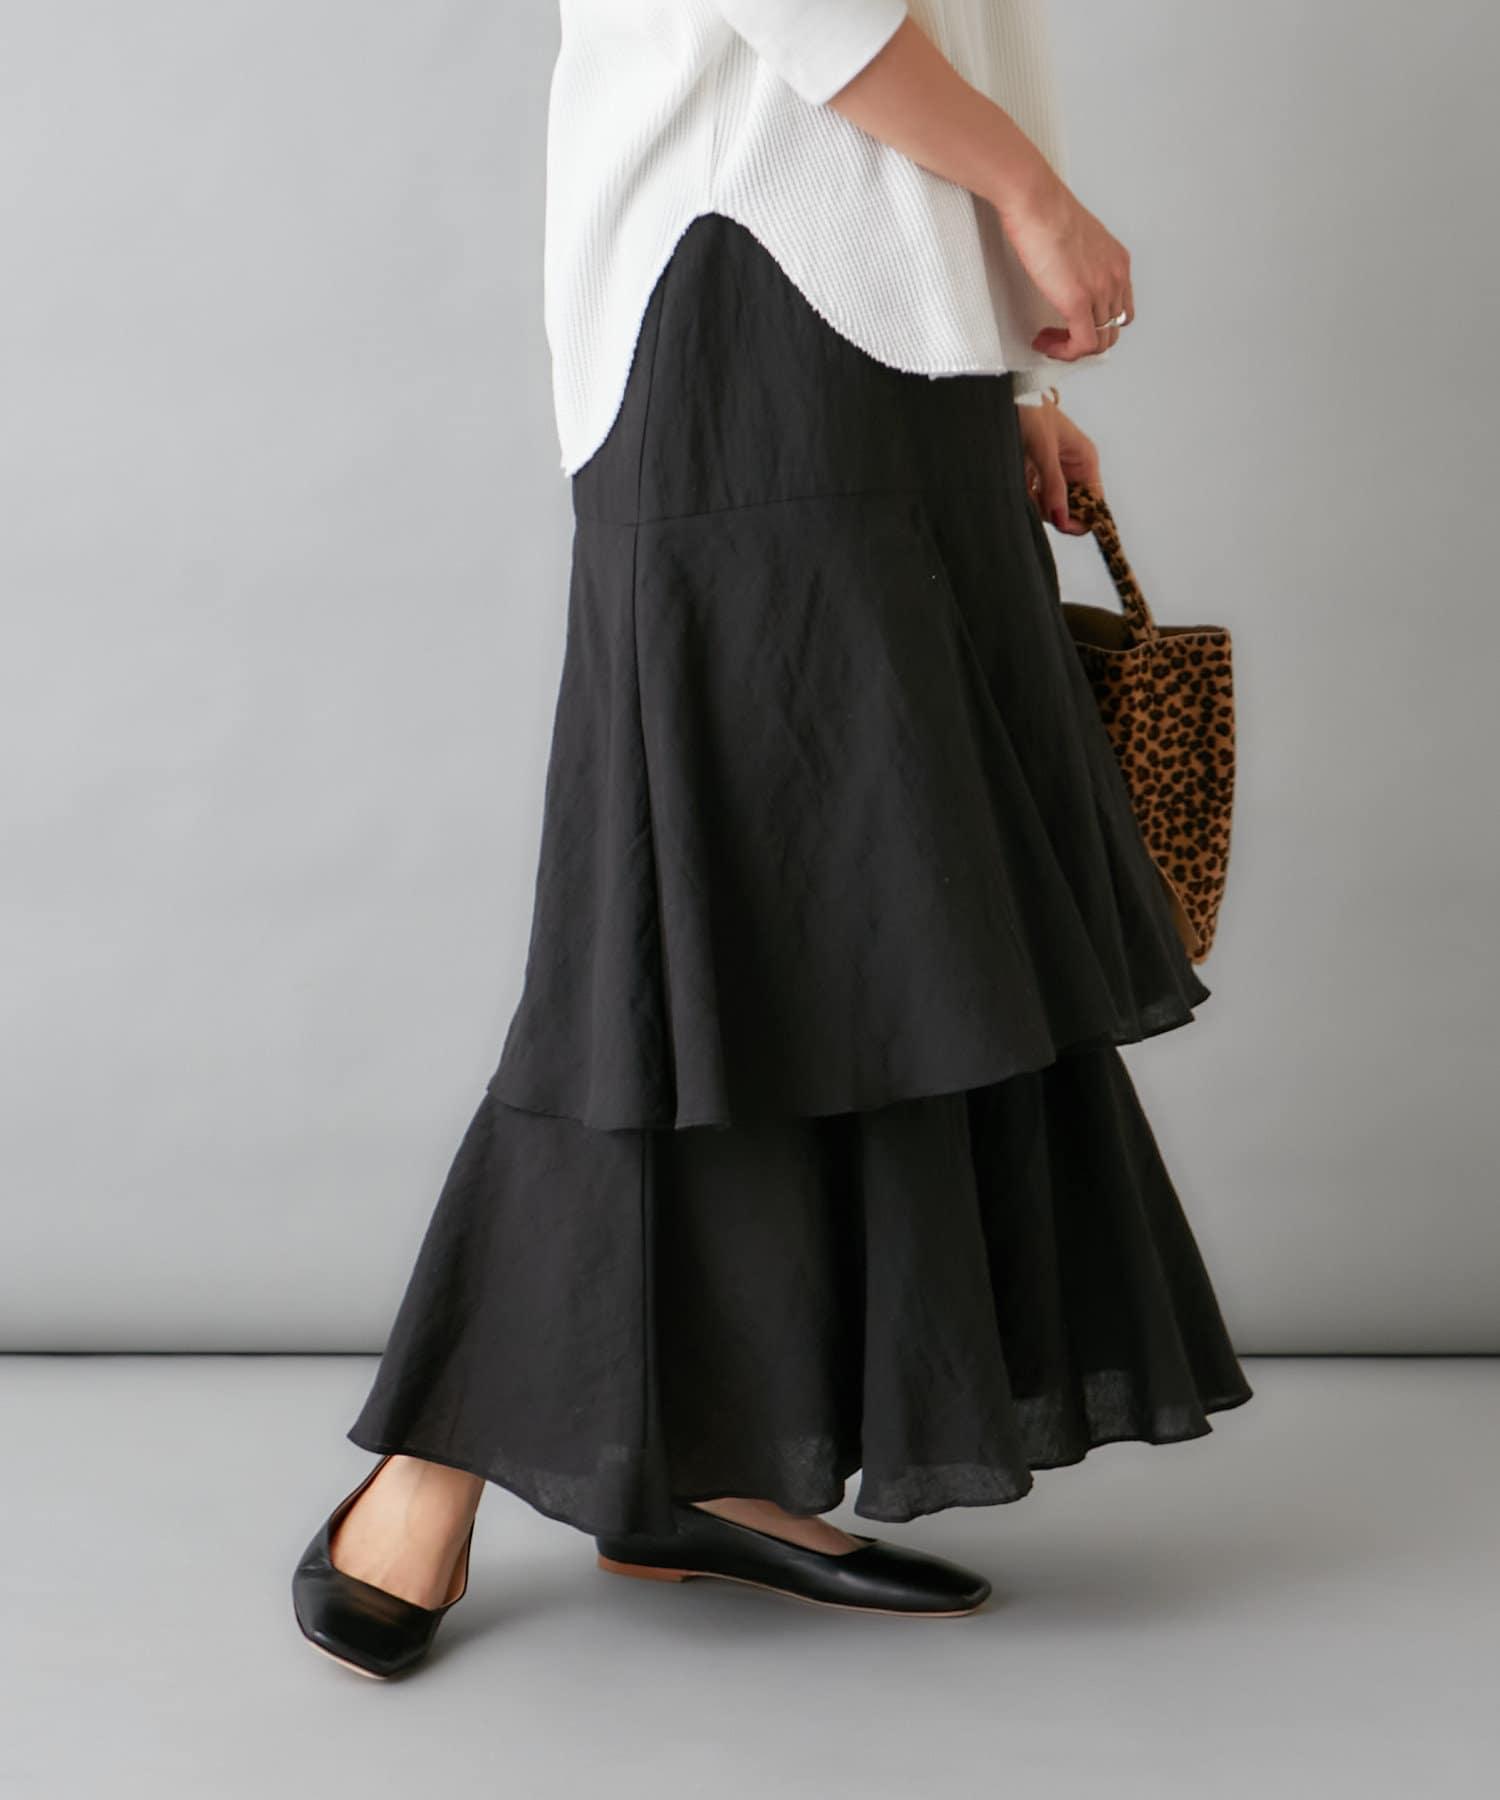 Omekashi(オメカシ) 【新色:チャコールグレー】ティアードロングスカート